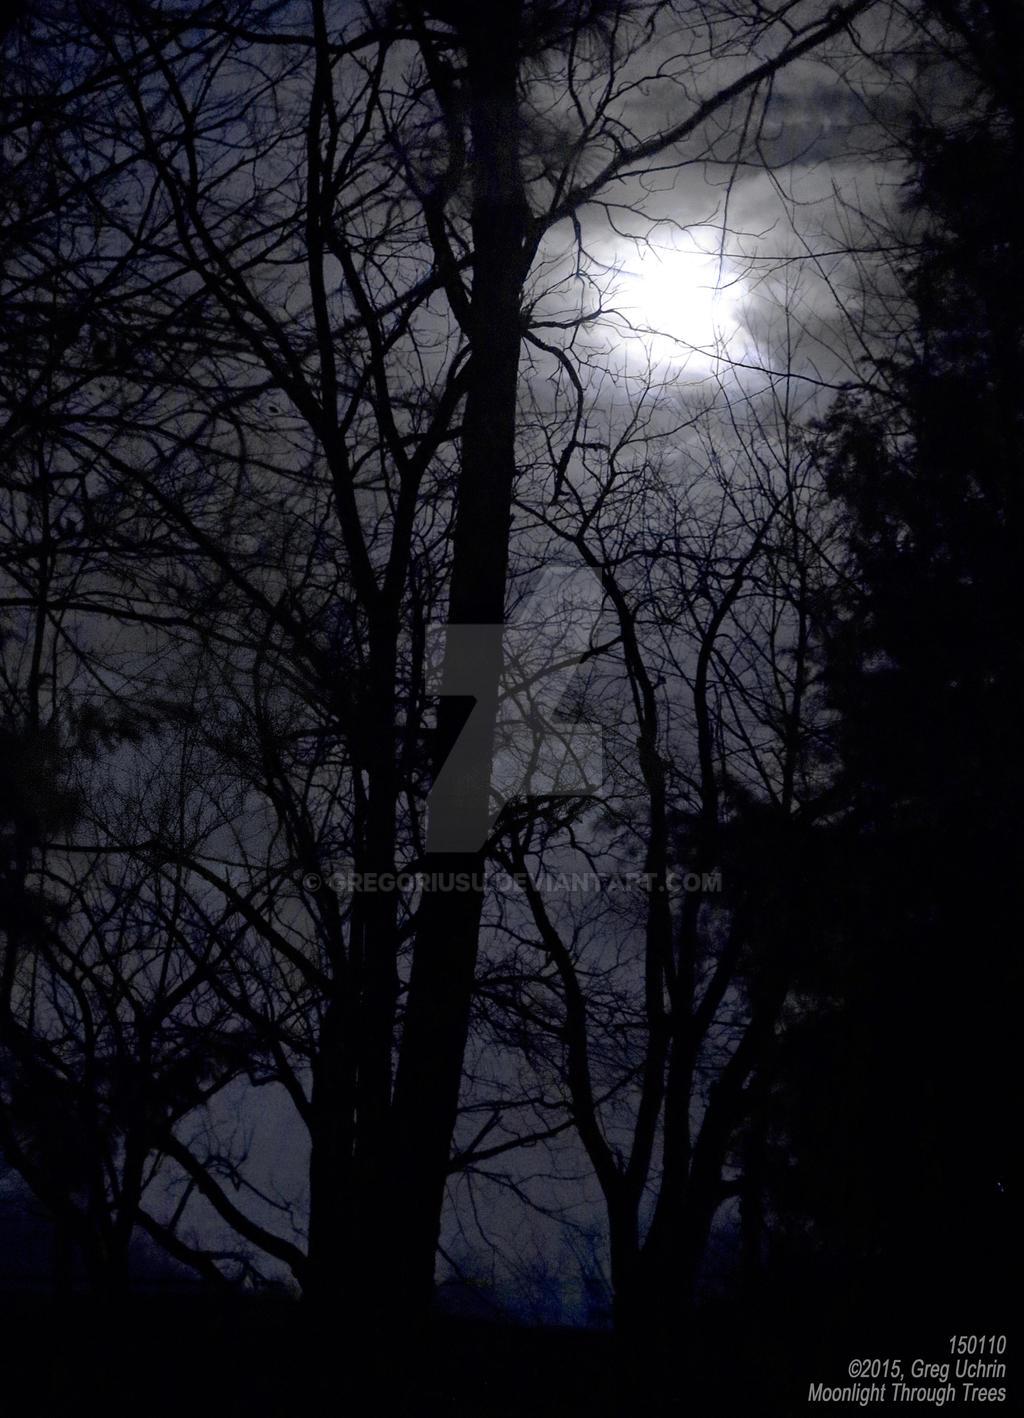 Moonlight Through Trees by GregoriusU